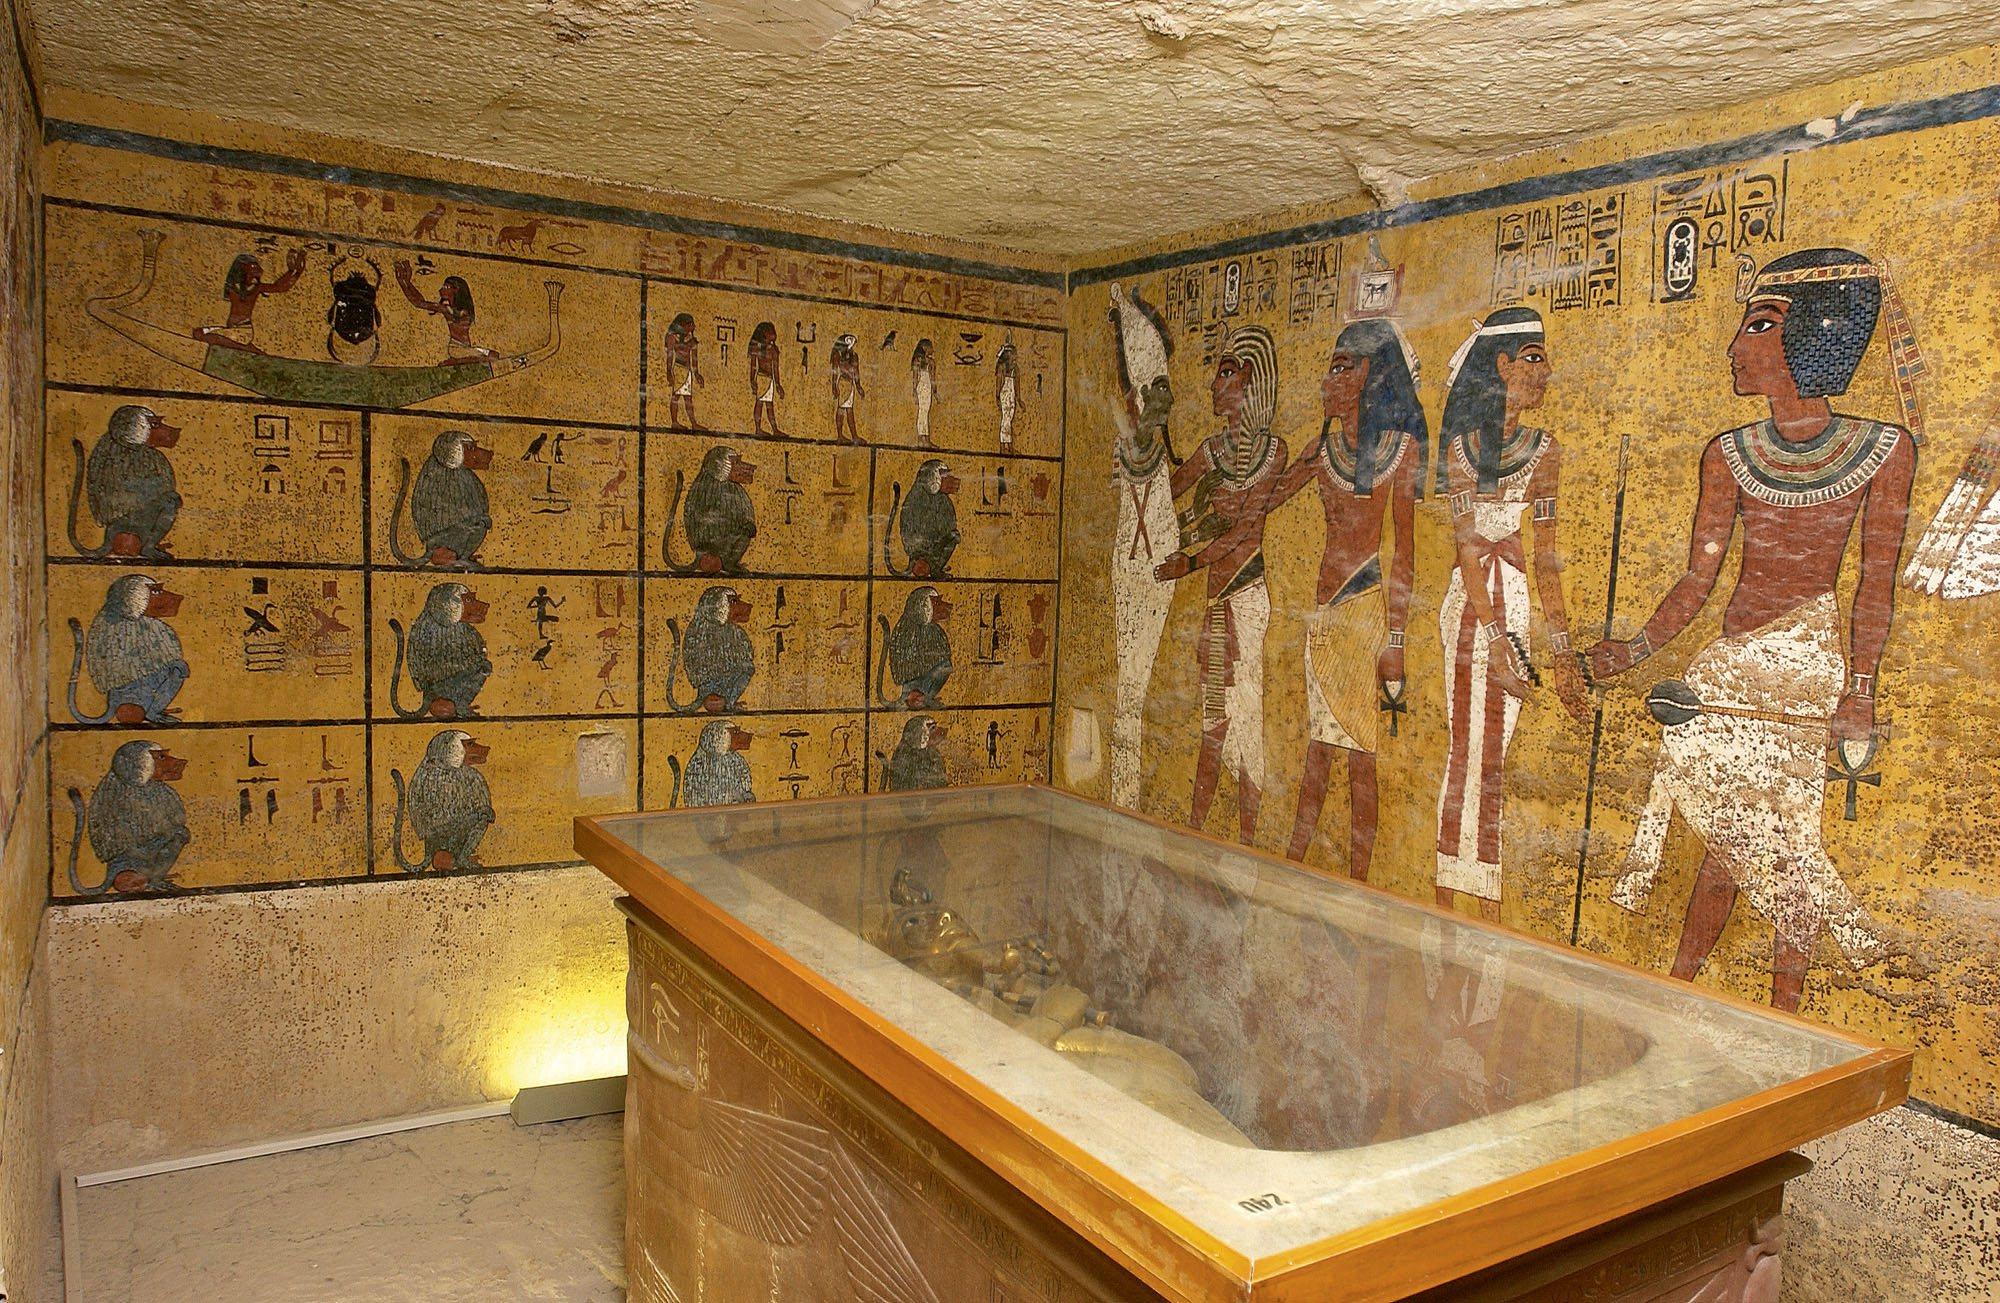 Creada una réplica de la tumba de Tutankhamón